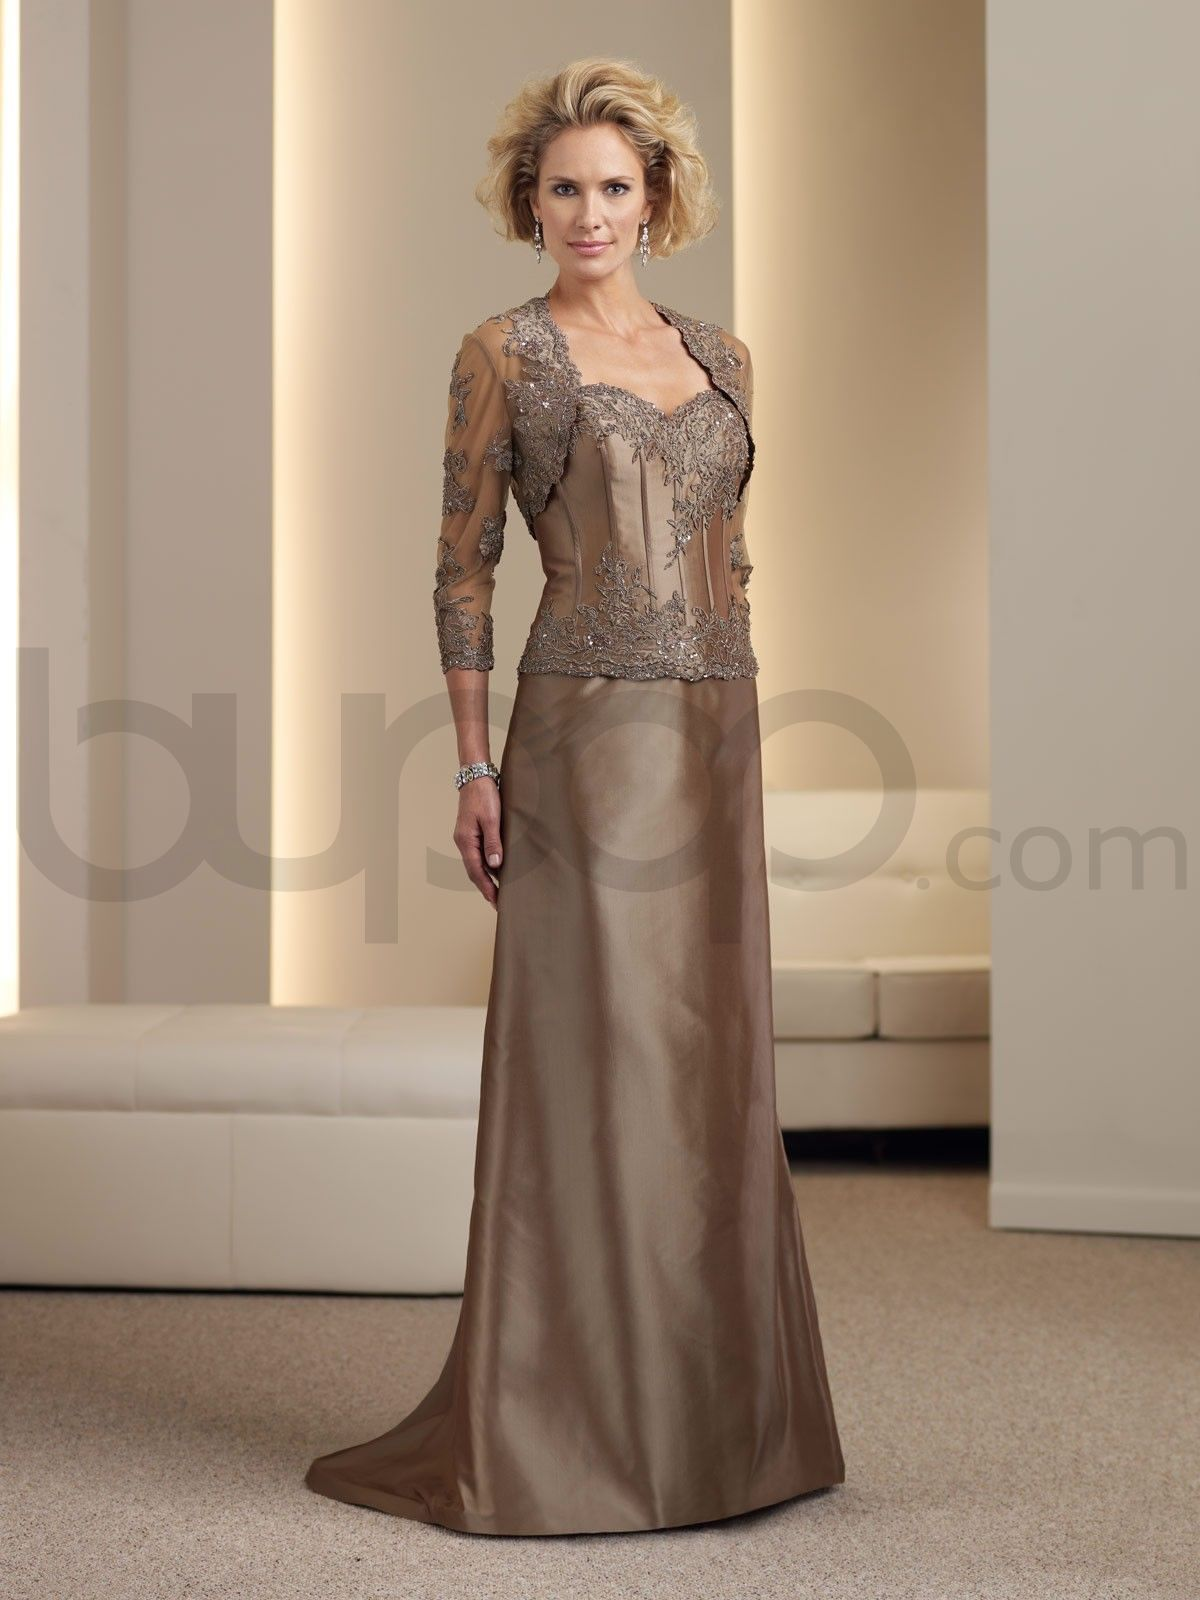 Mother Of The Bride Dresses | ... Boned Bodice Sweetheart Neckline ...